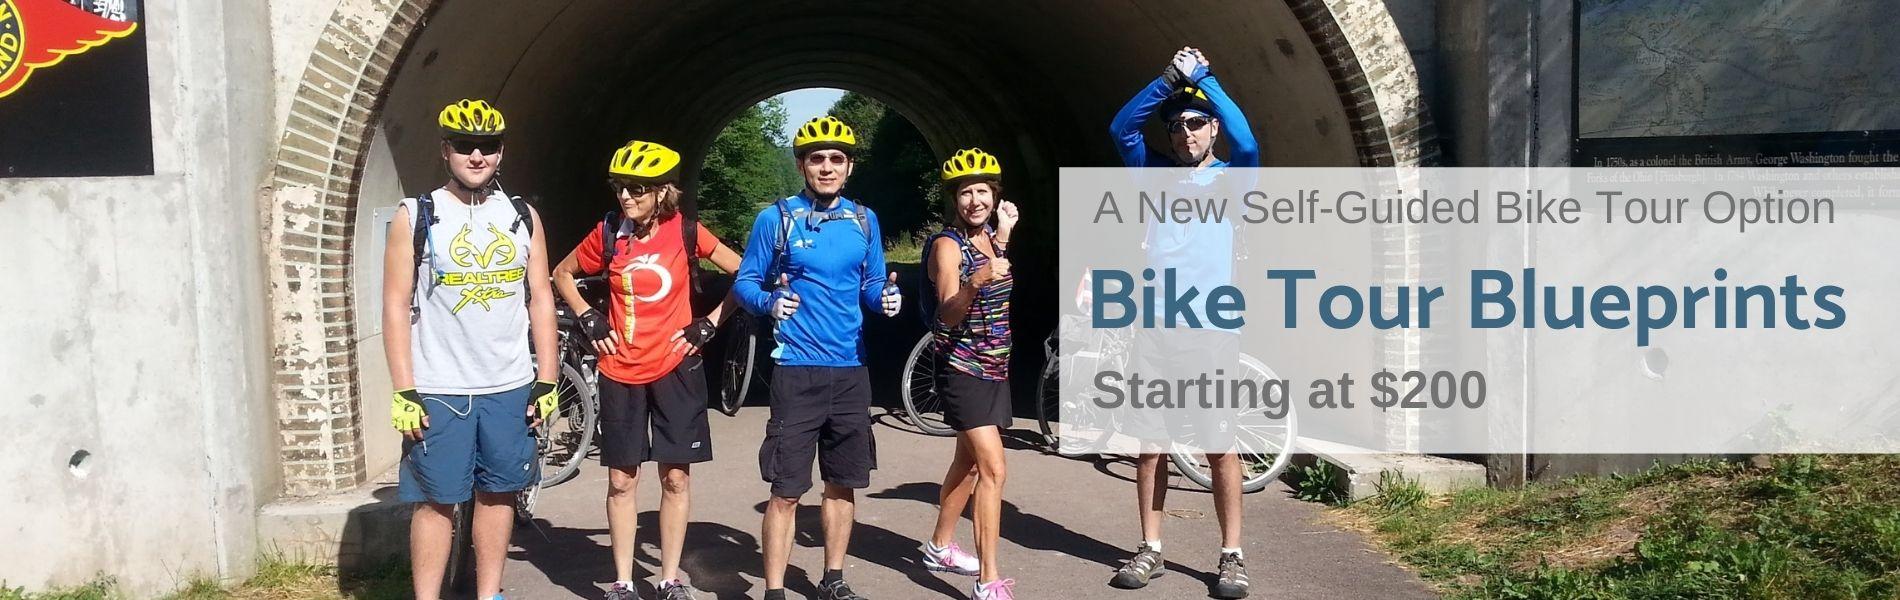 bike tour blueprints header 5